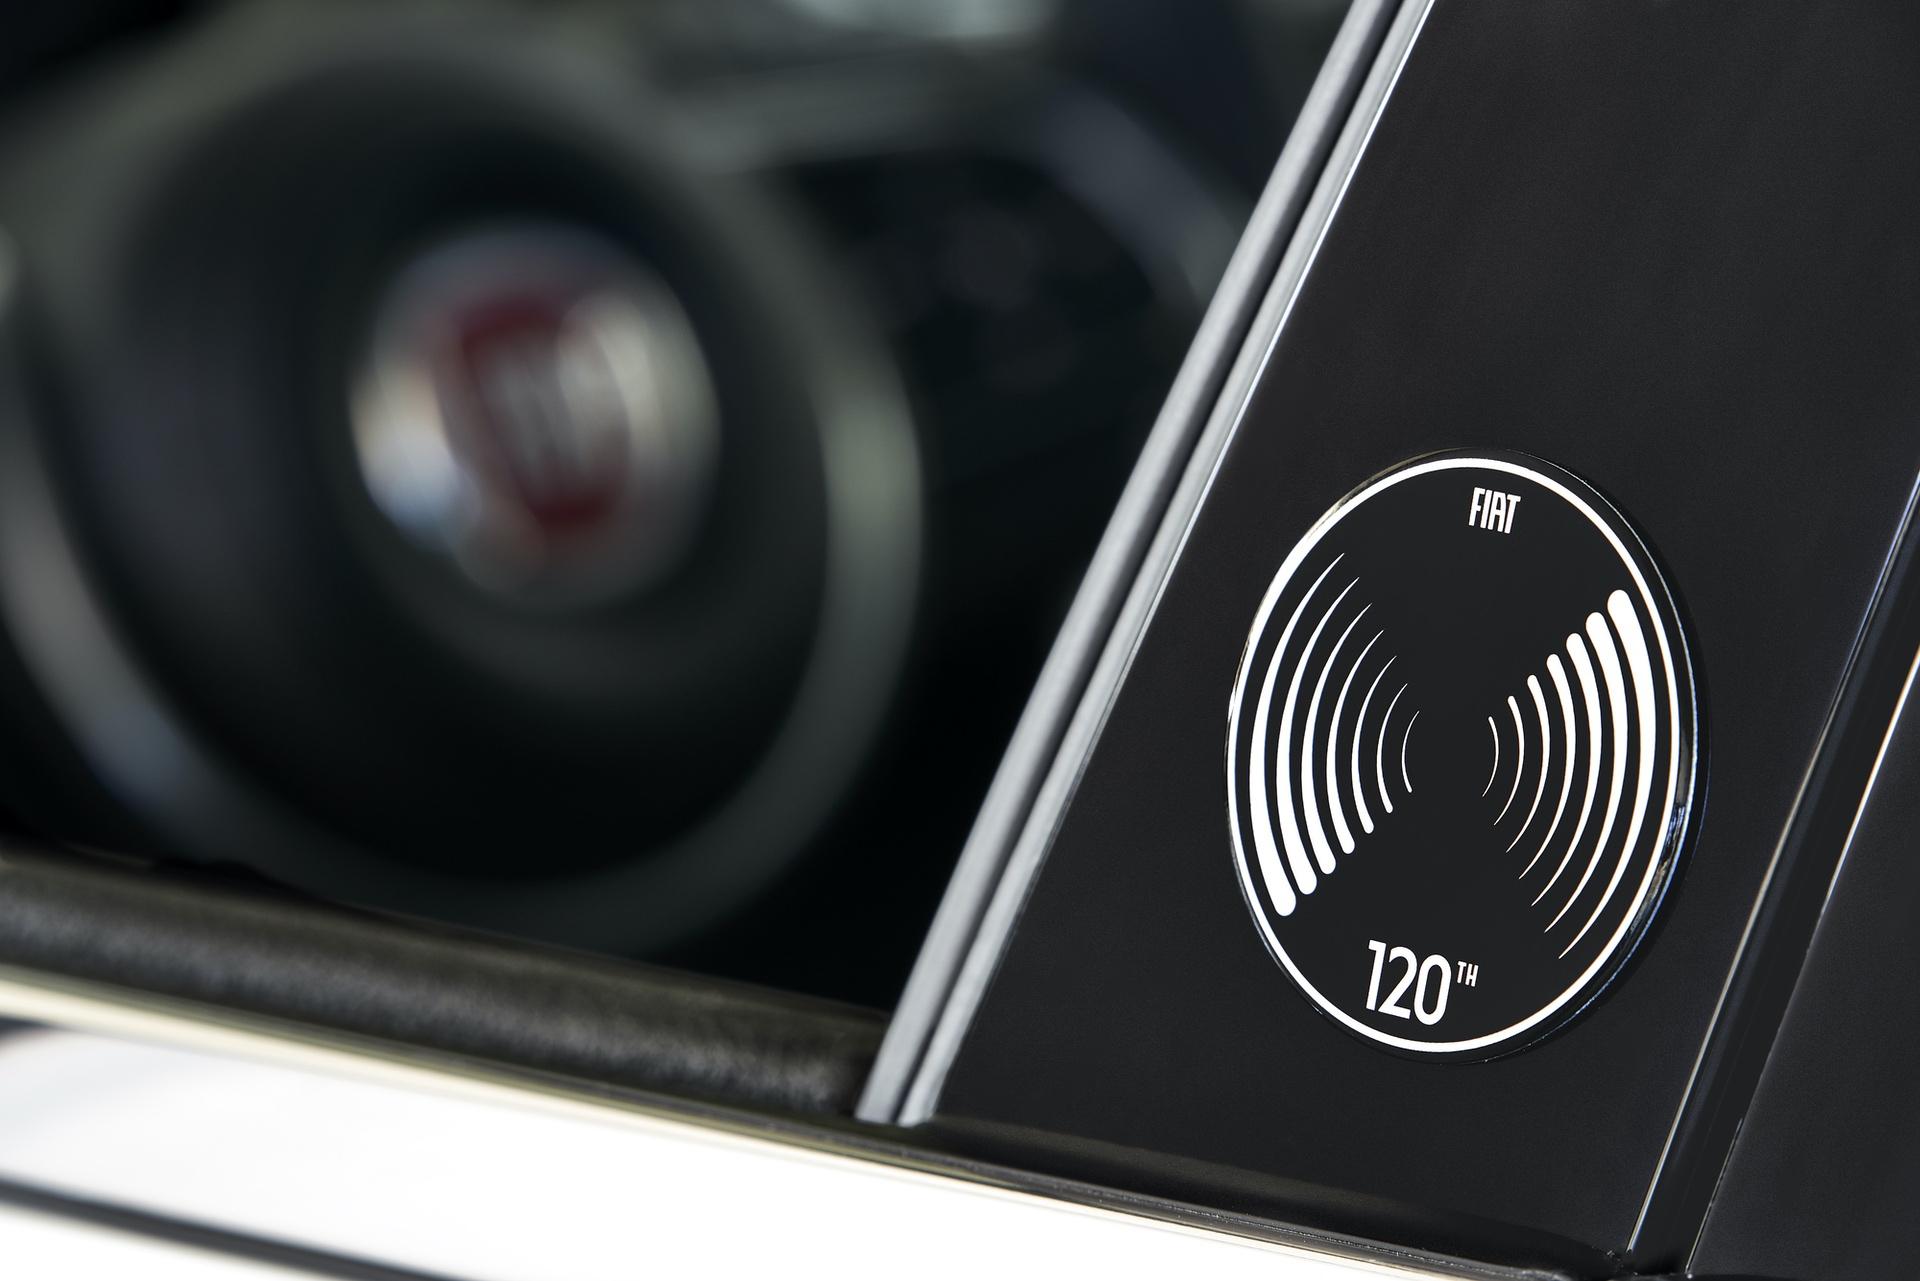 190225_Fiat_Badge-120th_10